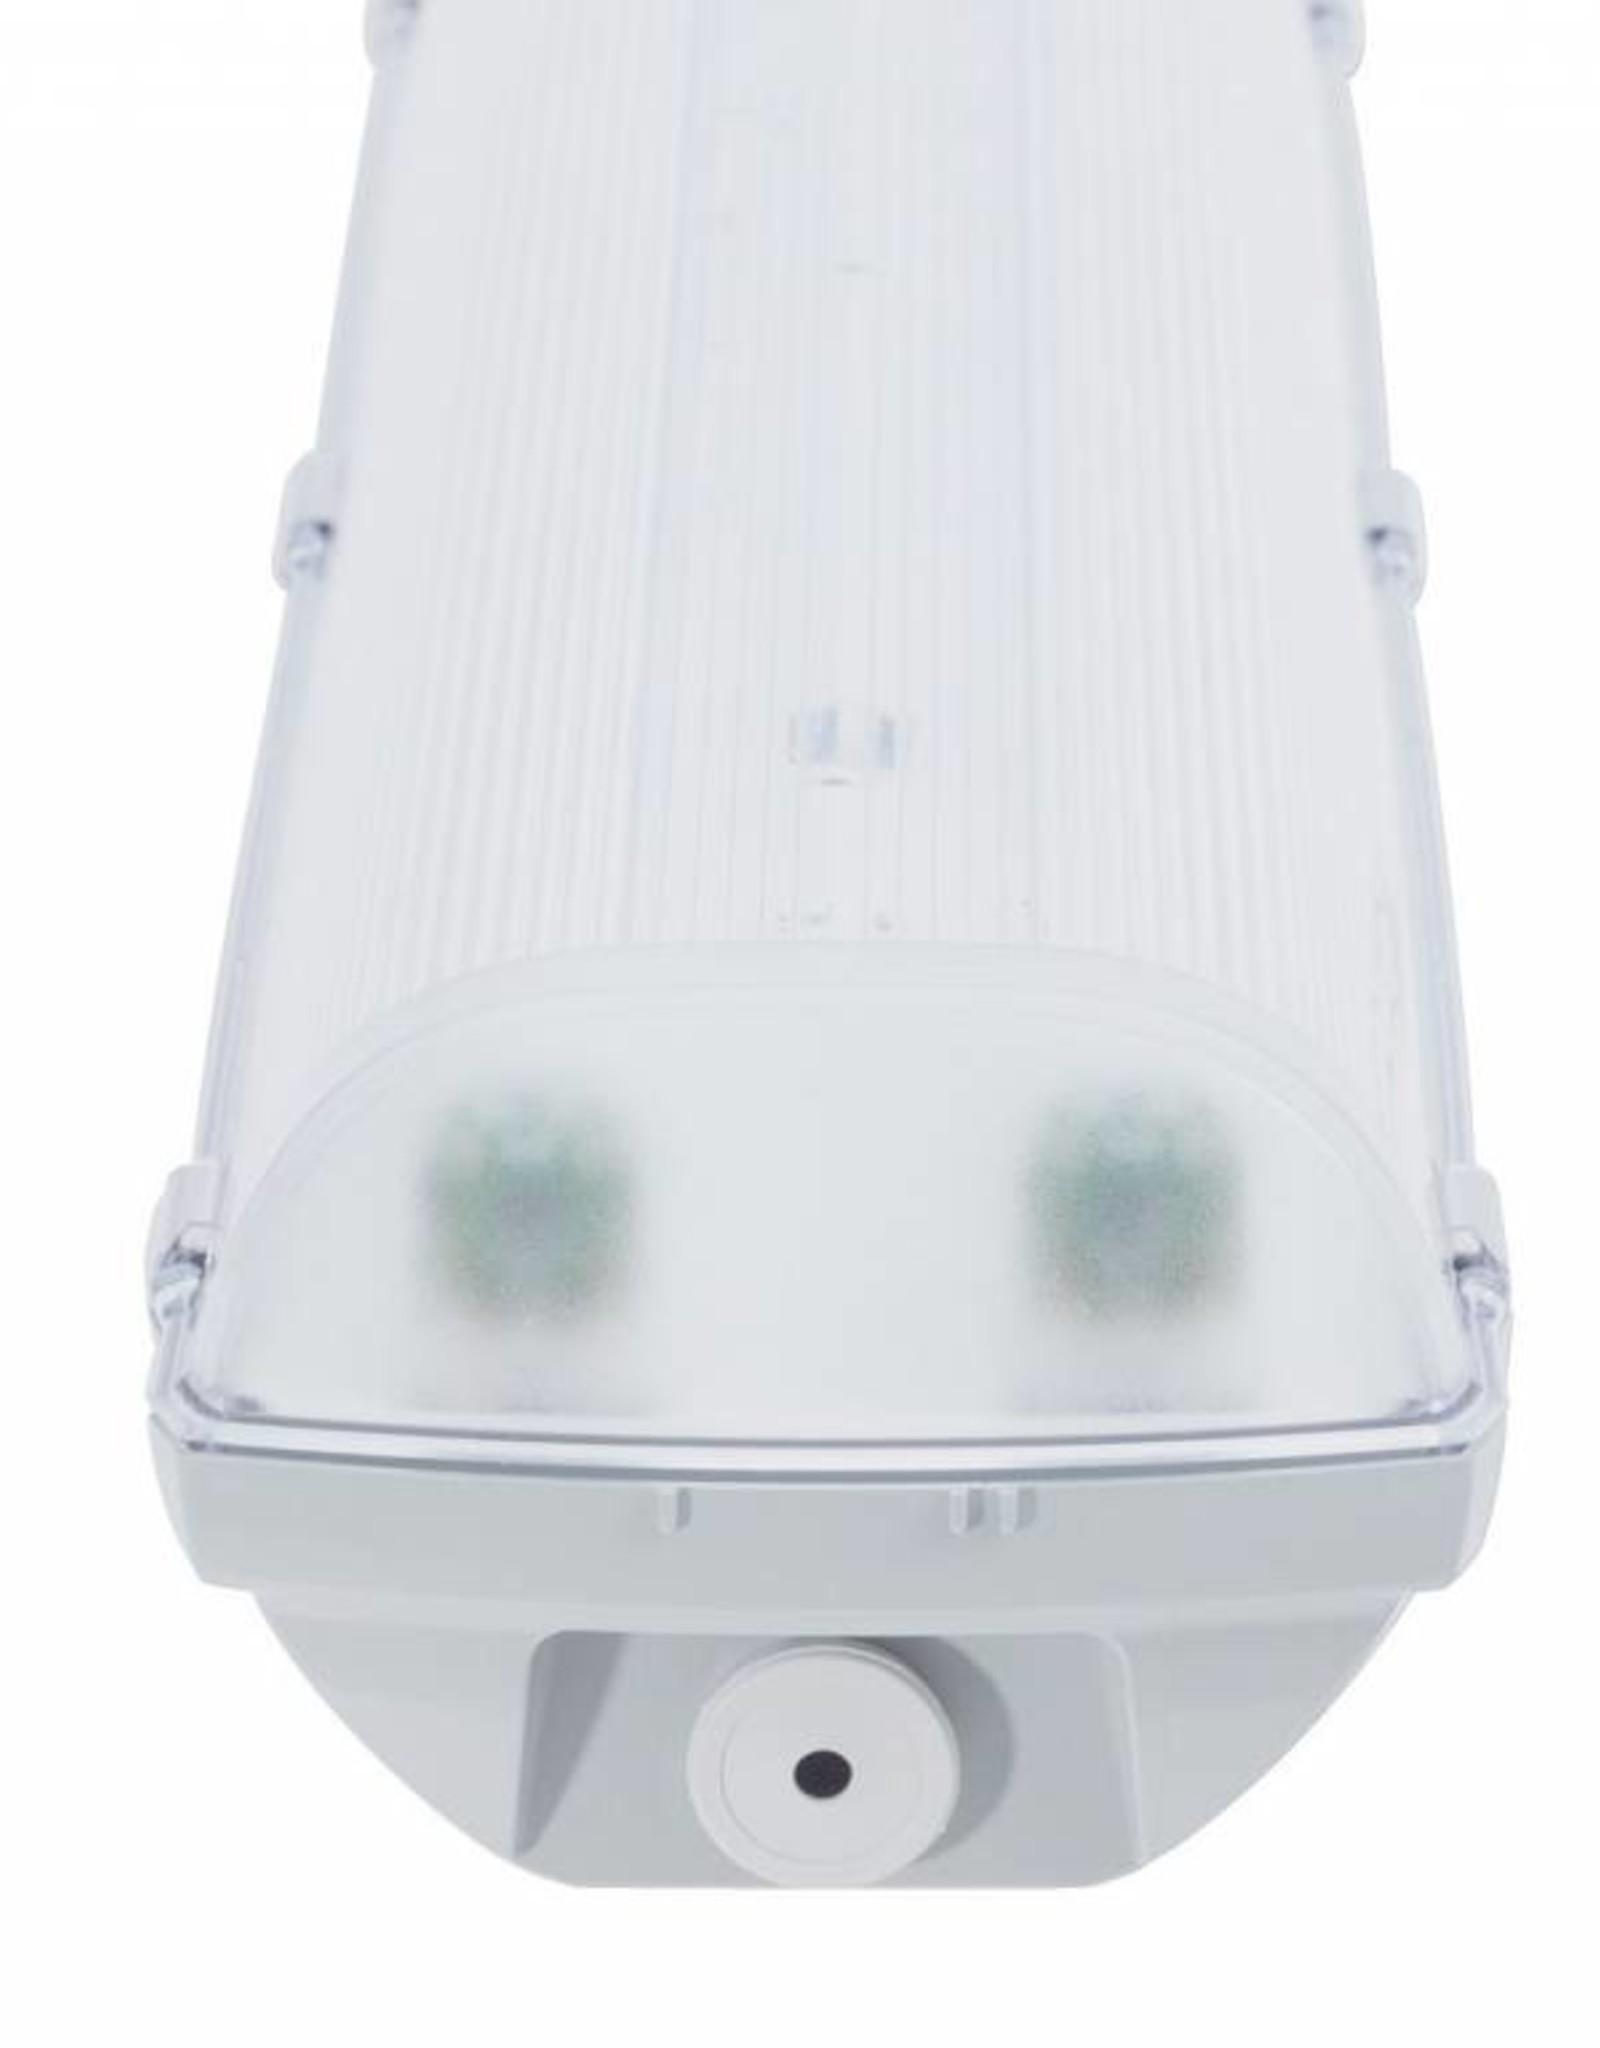 Prima 2x36W - ABS - inox clips - HF ballast